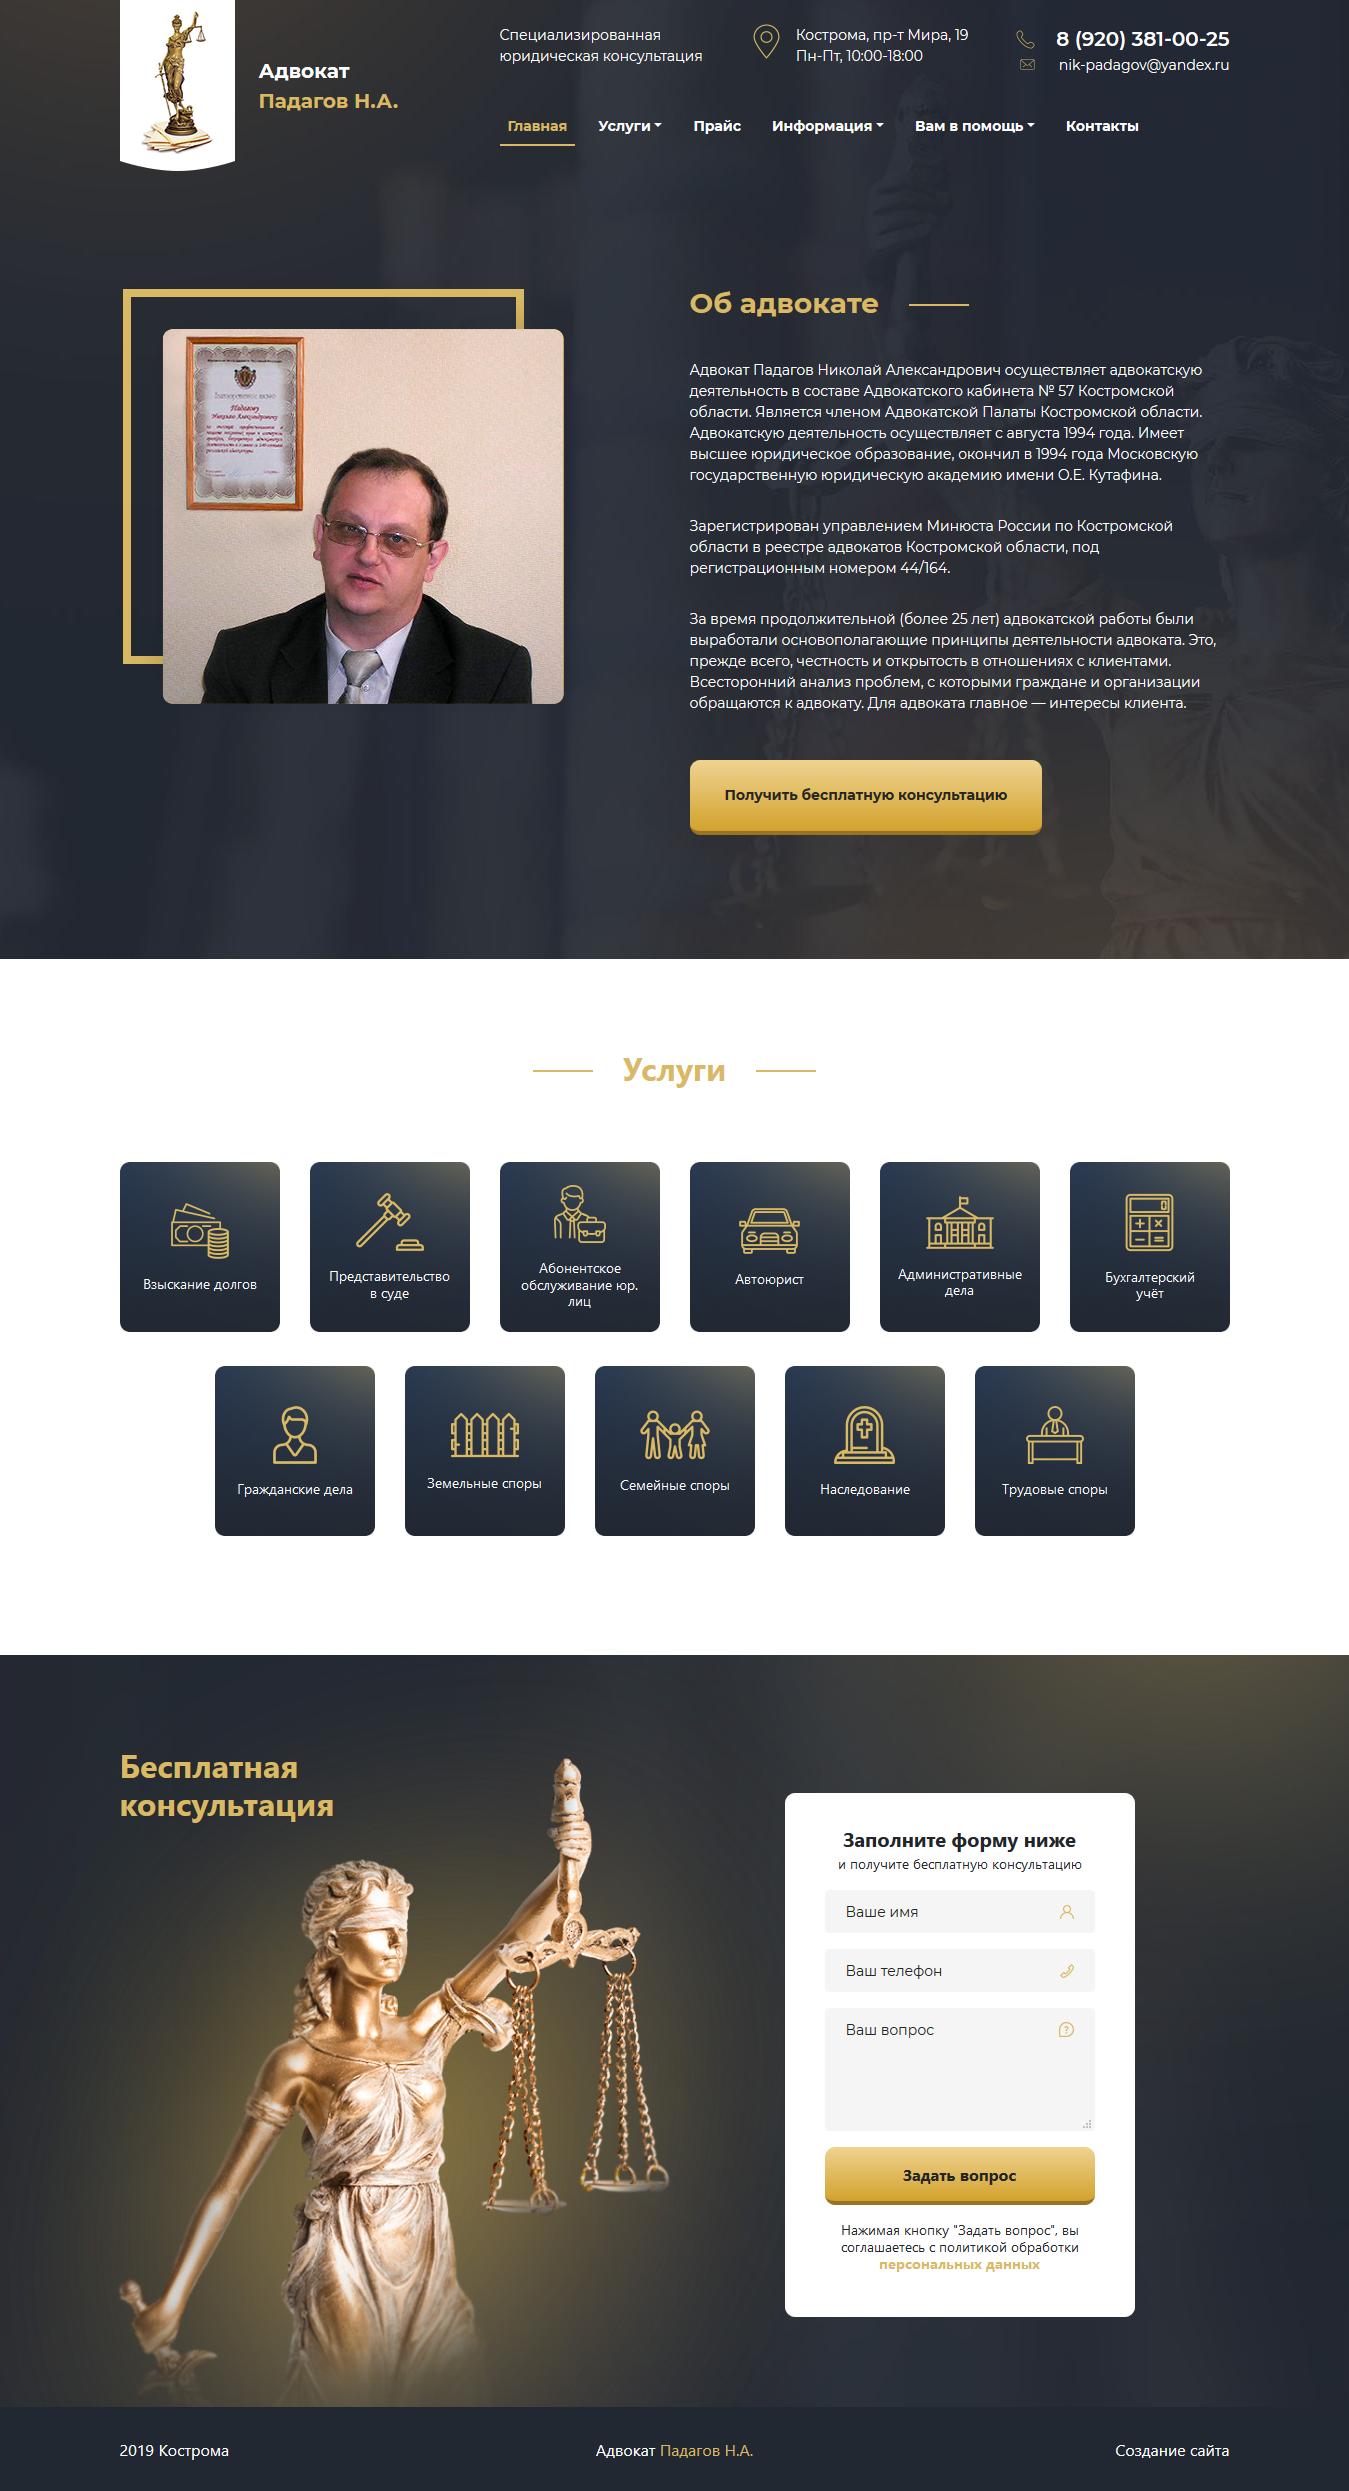 Сайт адвоката. Создание сайтов в Костроме